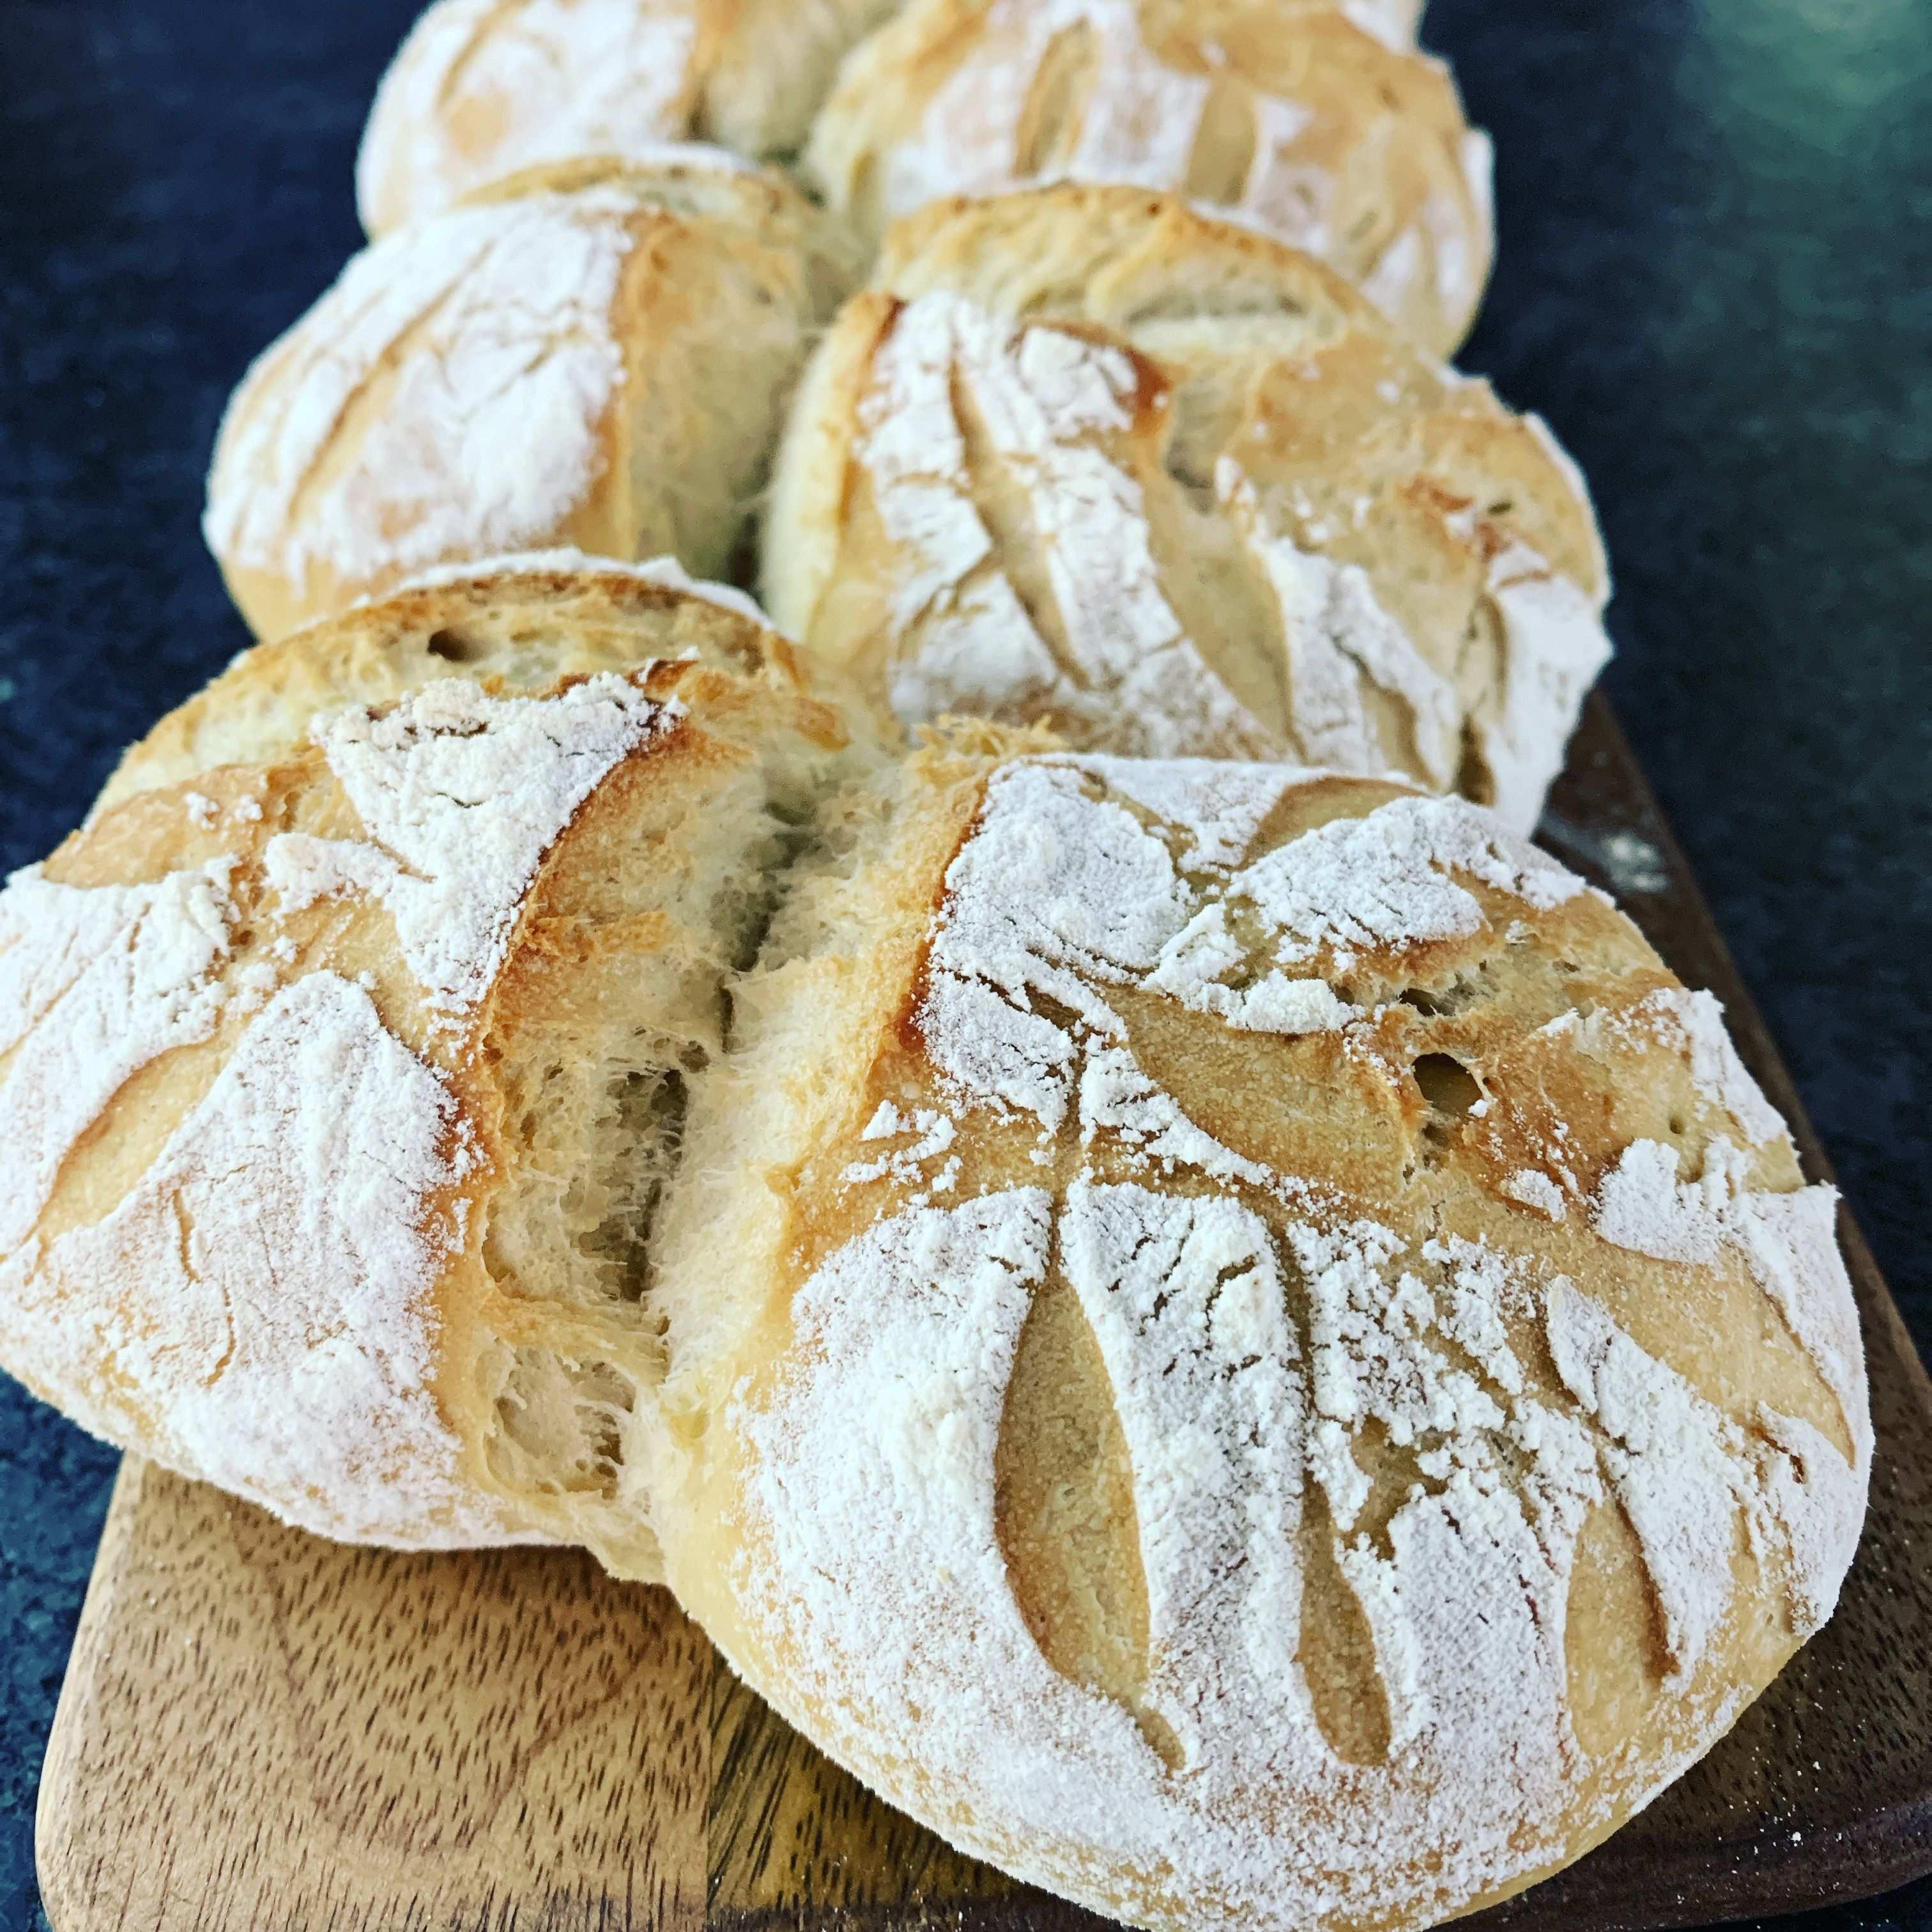 Brotchen Zwillinge Brot Backen Rezept Einfach Teig Kartoffelbrot